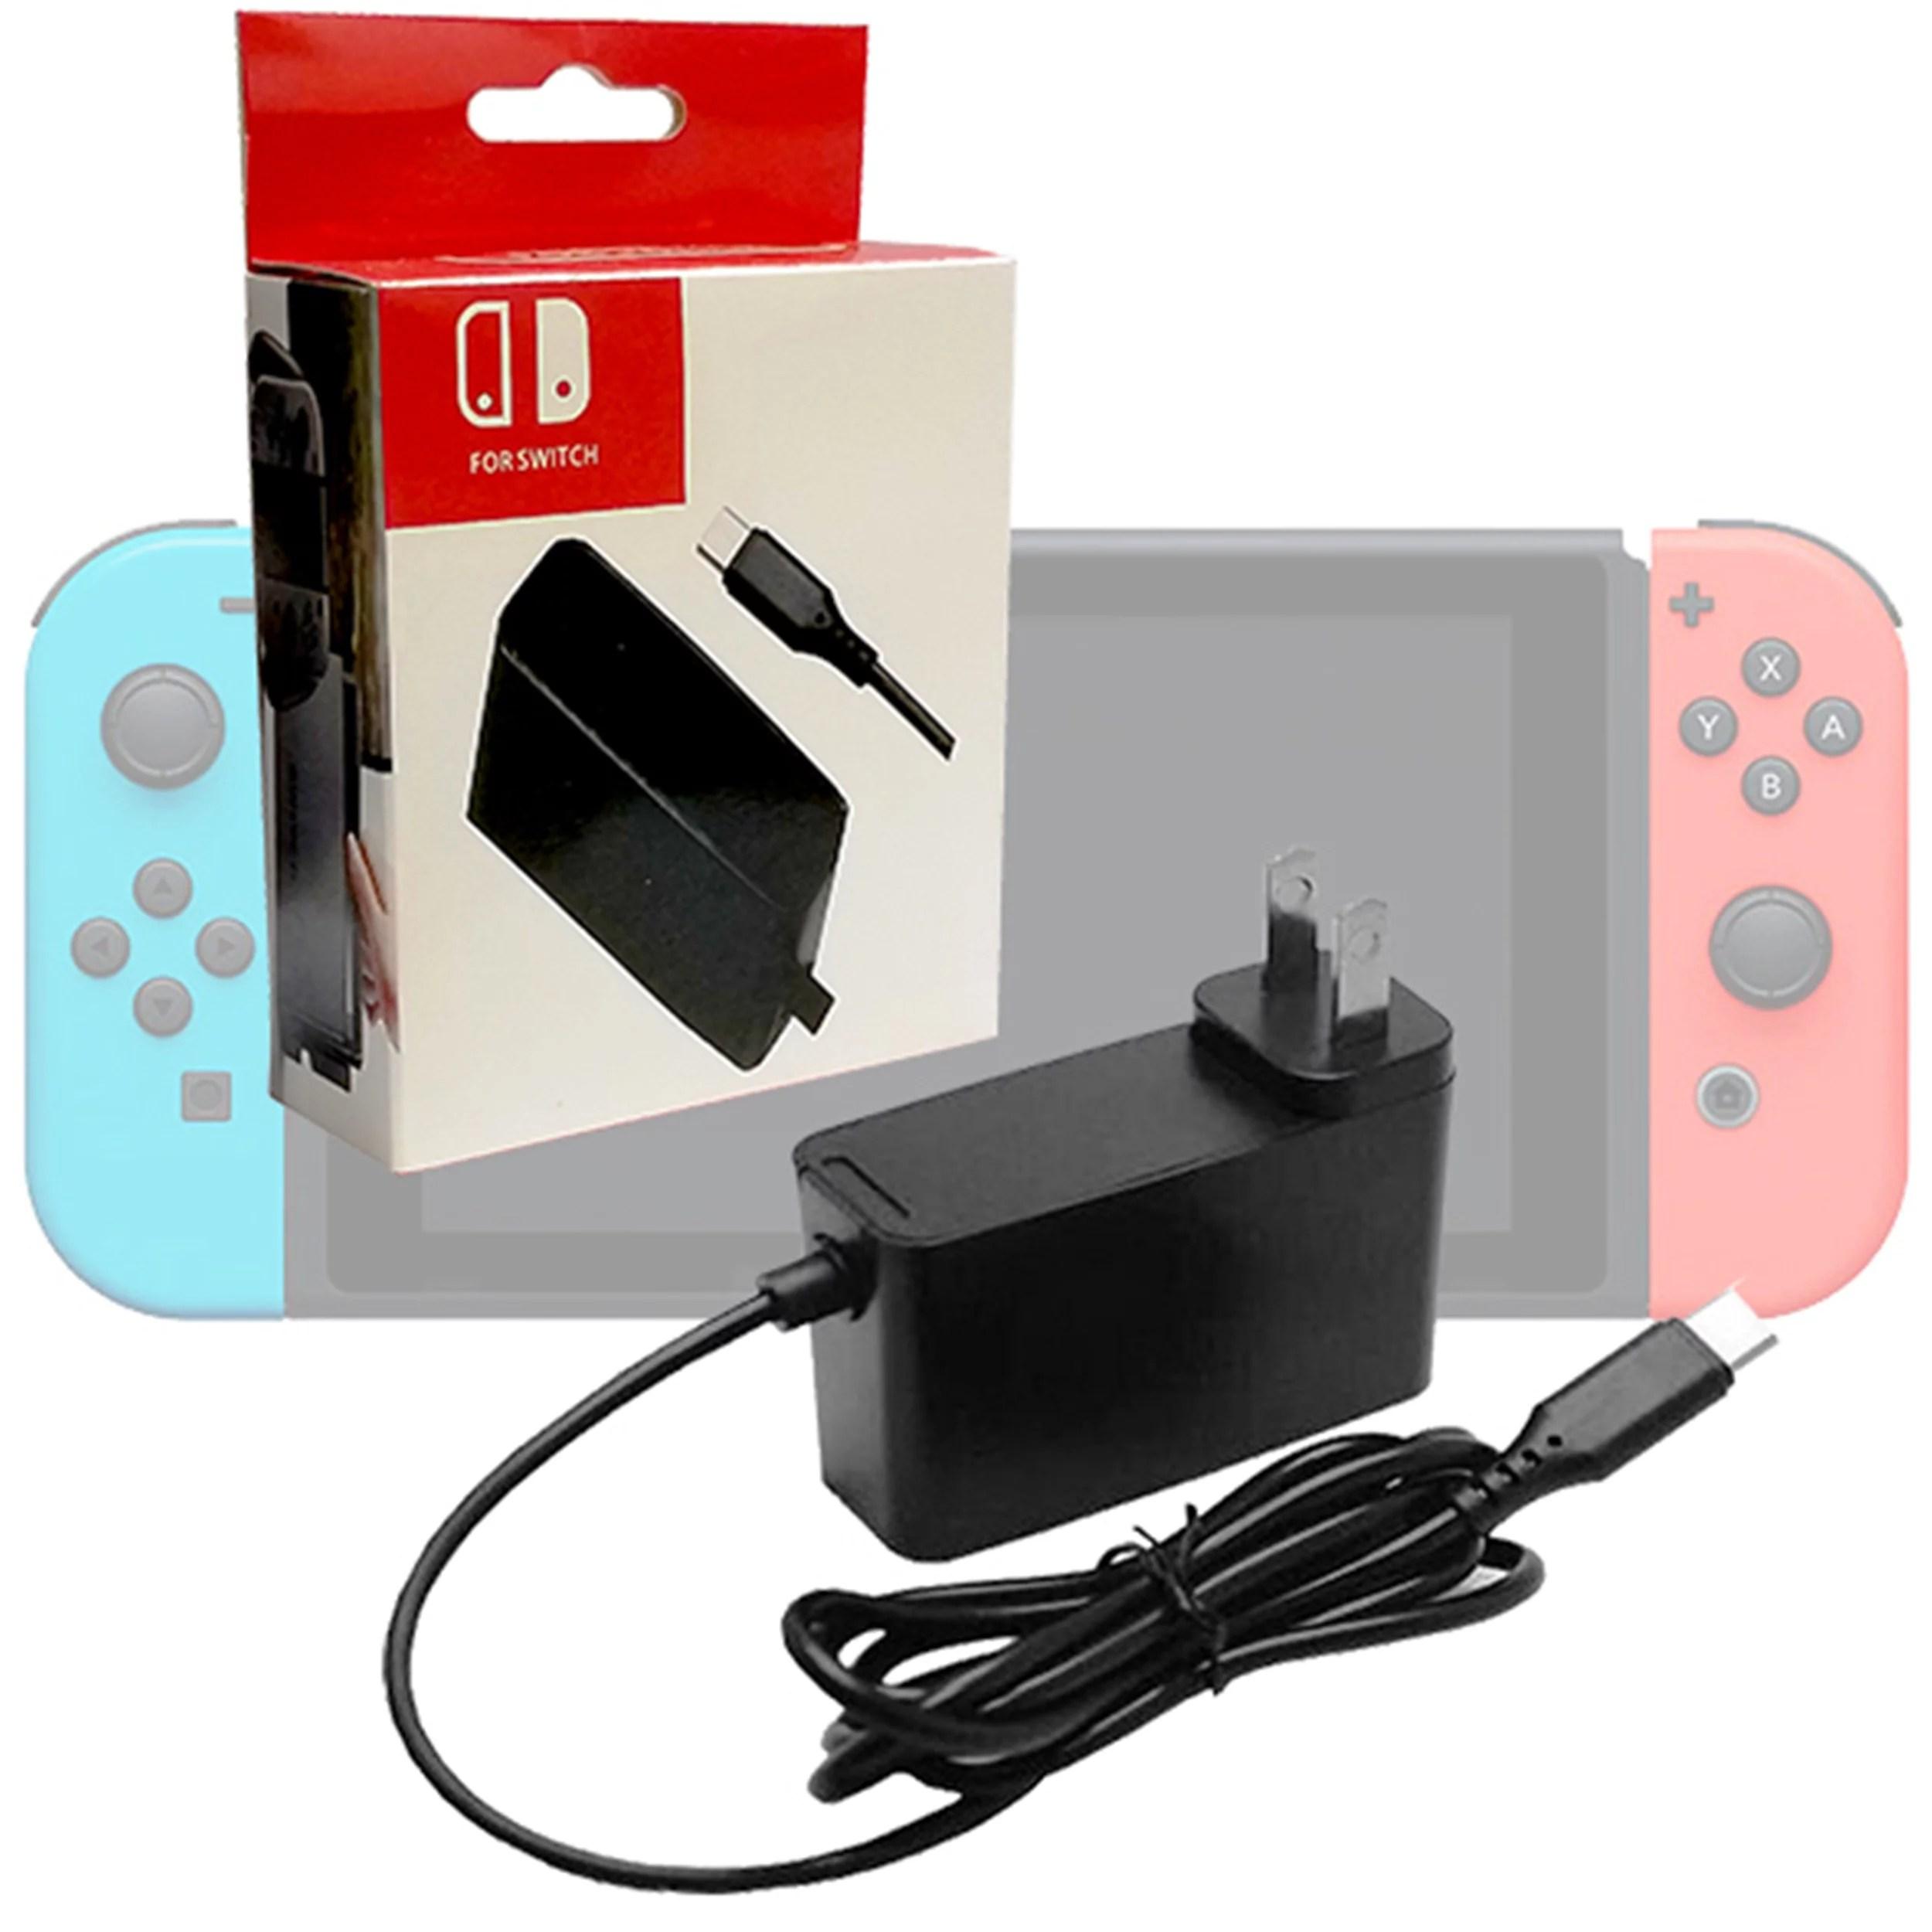 Generic AC Adapter Power Supply for Nintendo Switch Wall & Travel Charger (USA) - Walmart.com - Walmart.com